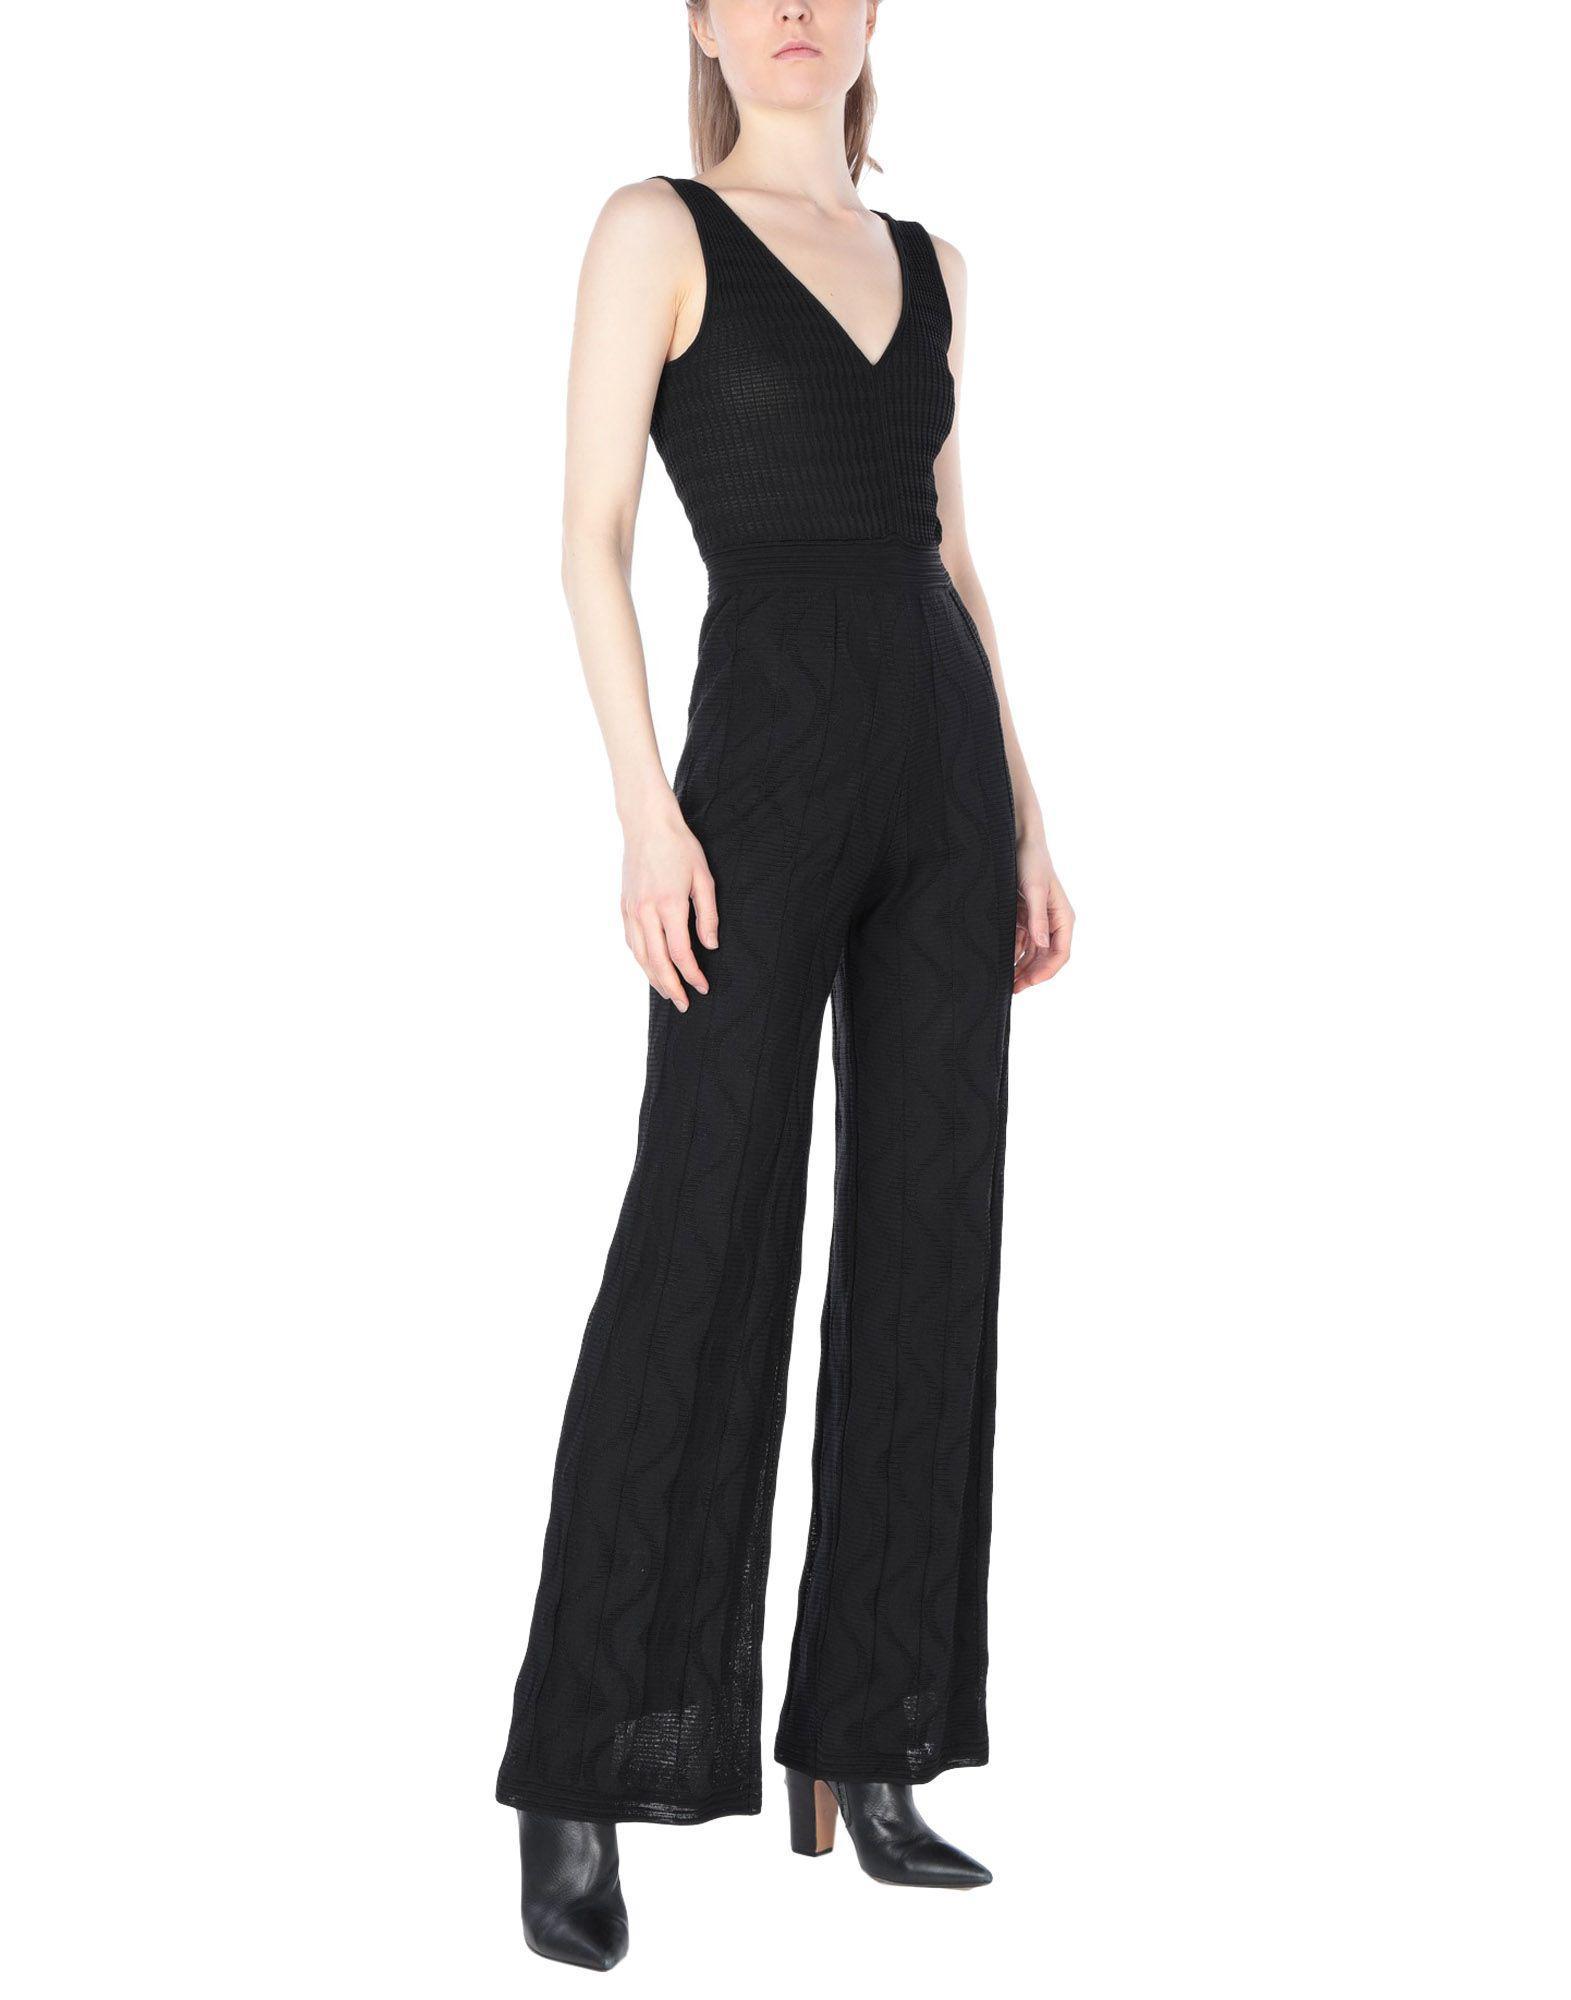 0e963bbb3825 Lyst - M Missoni Jumpsuit in Black